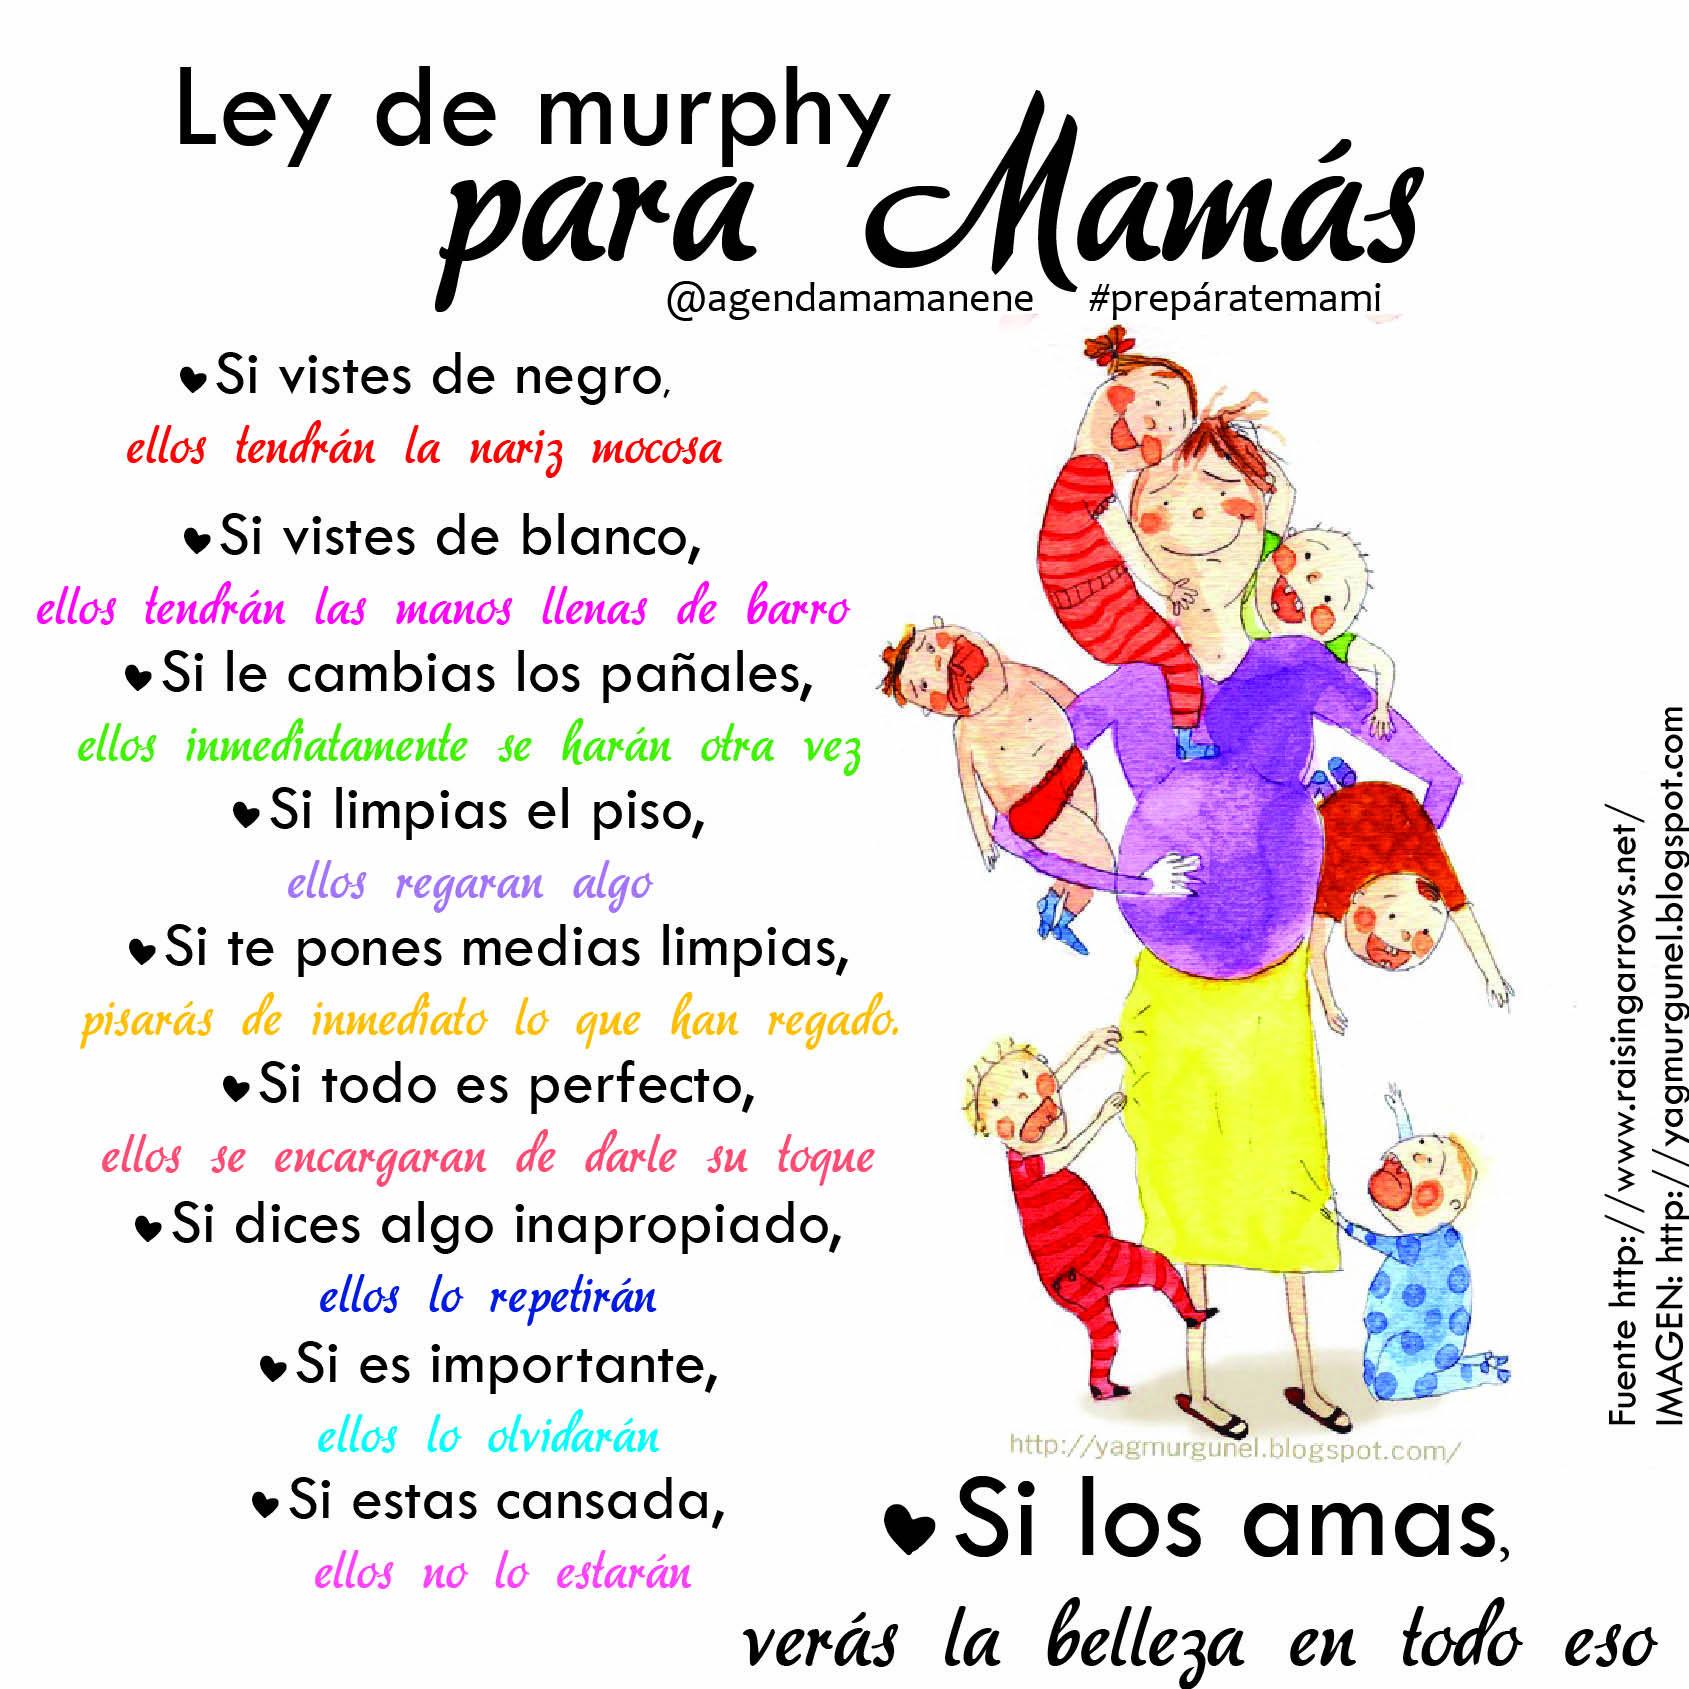 Ley De Murphy Para Mamas